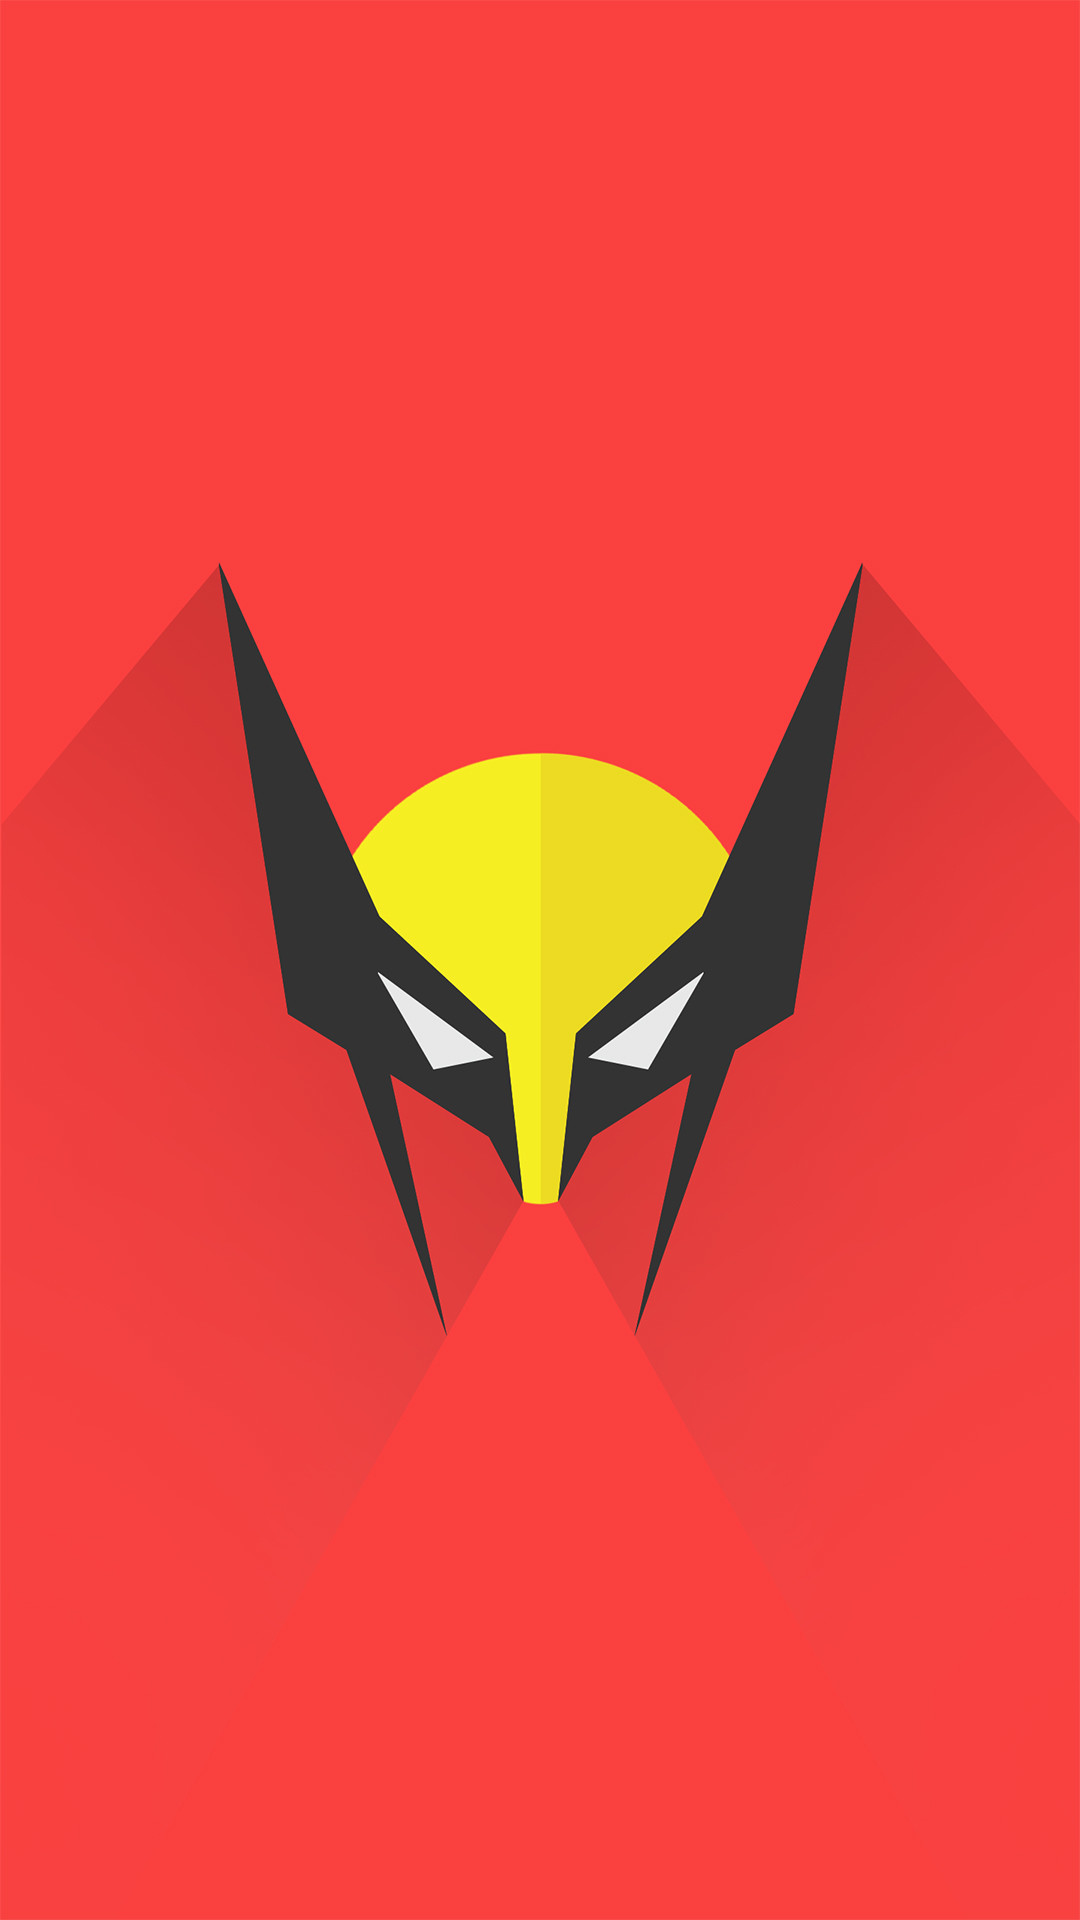 1080x1920, Download Top 30 Wallpaper Iphone 6 Plus - Wolverine Wallpaper For Iphone 7 - HD Wallpaper